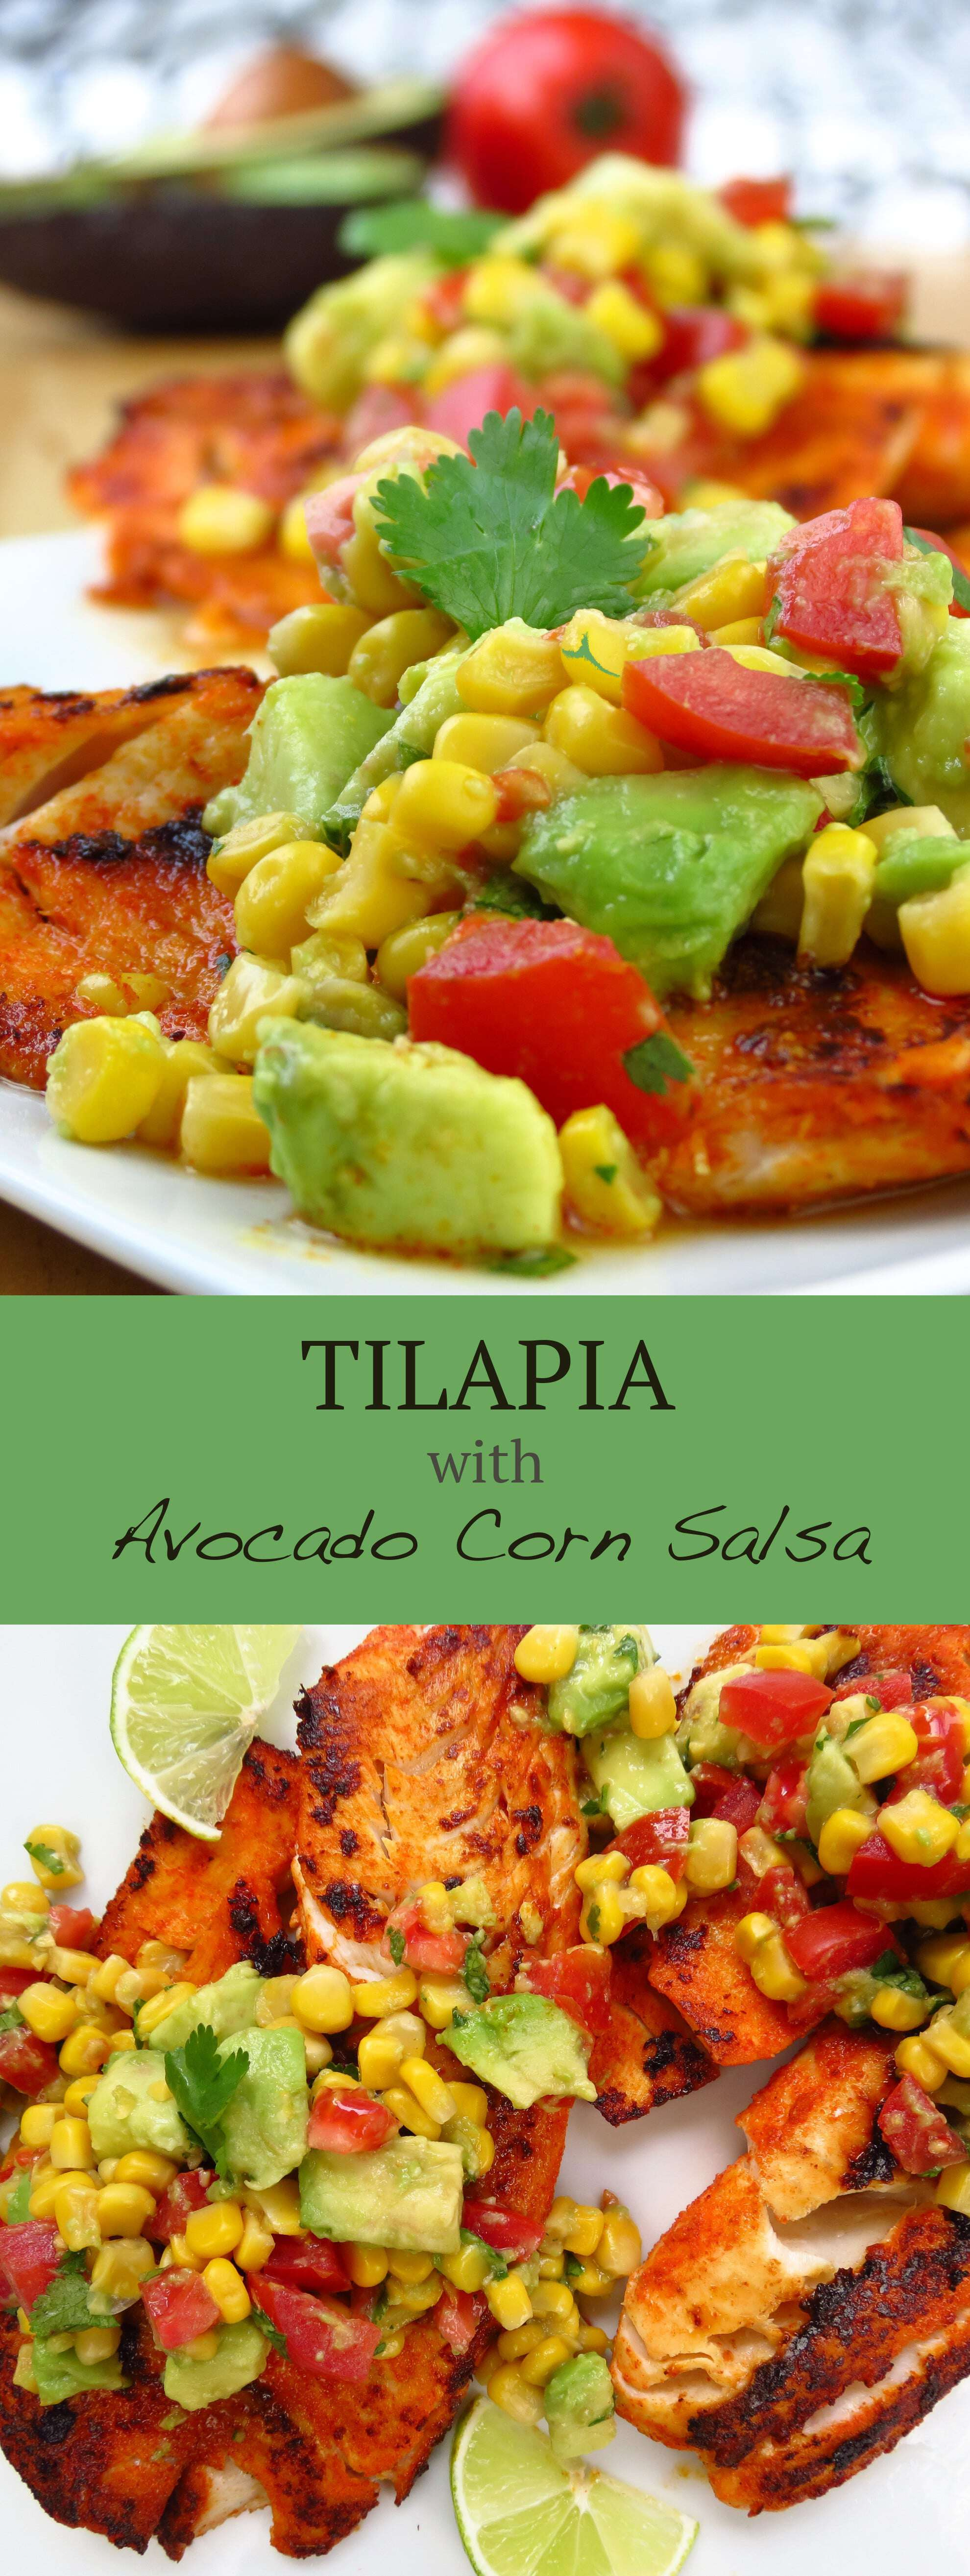 Tilapia with Avocado Corn Salsa